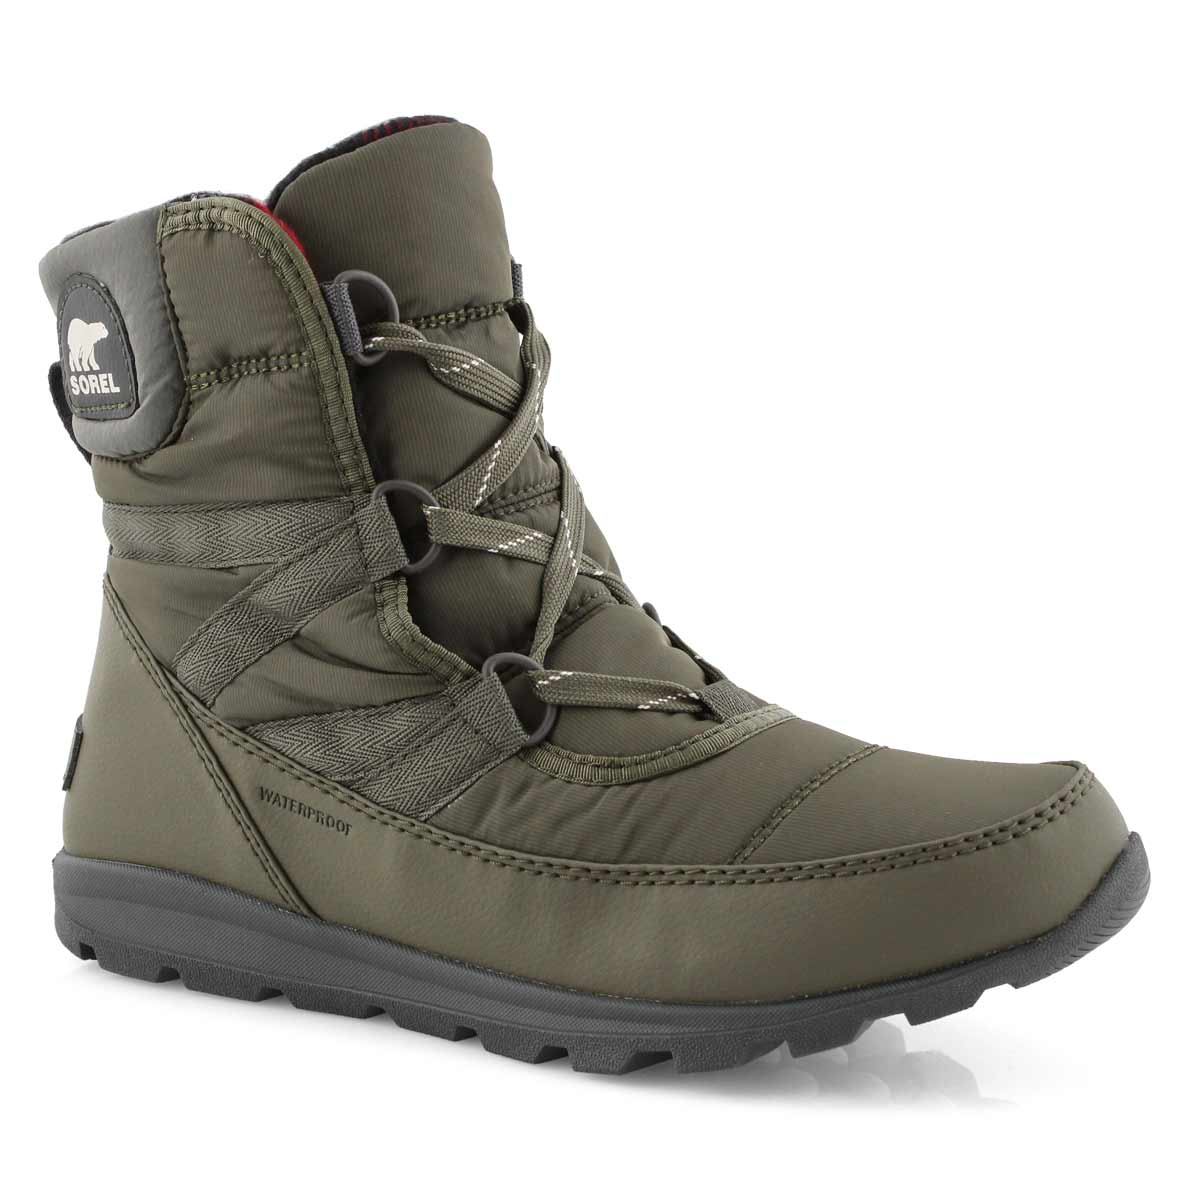 Lds WhitneyShortLace alpn tndra wp boot